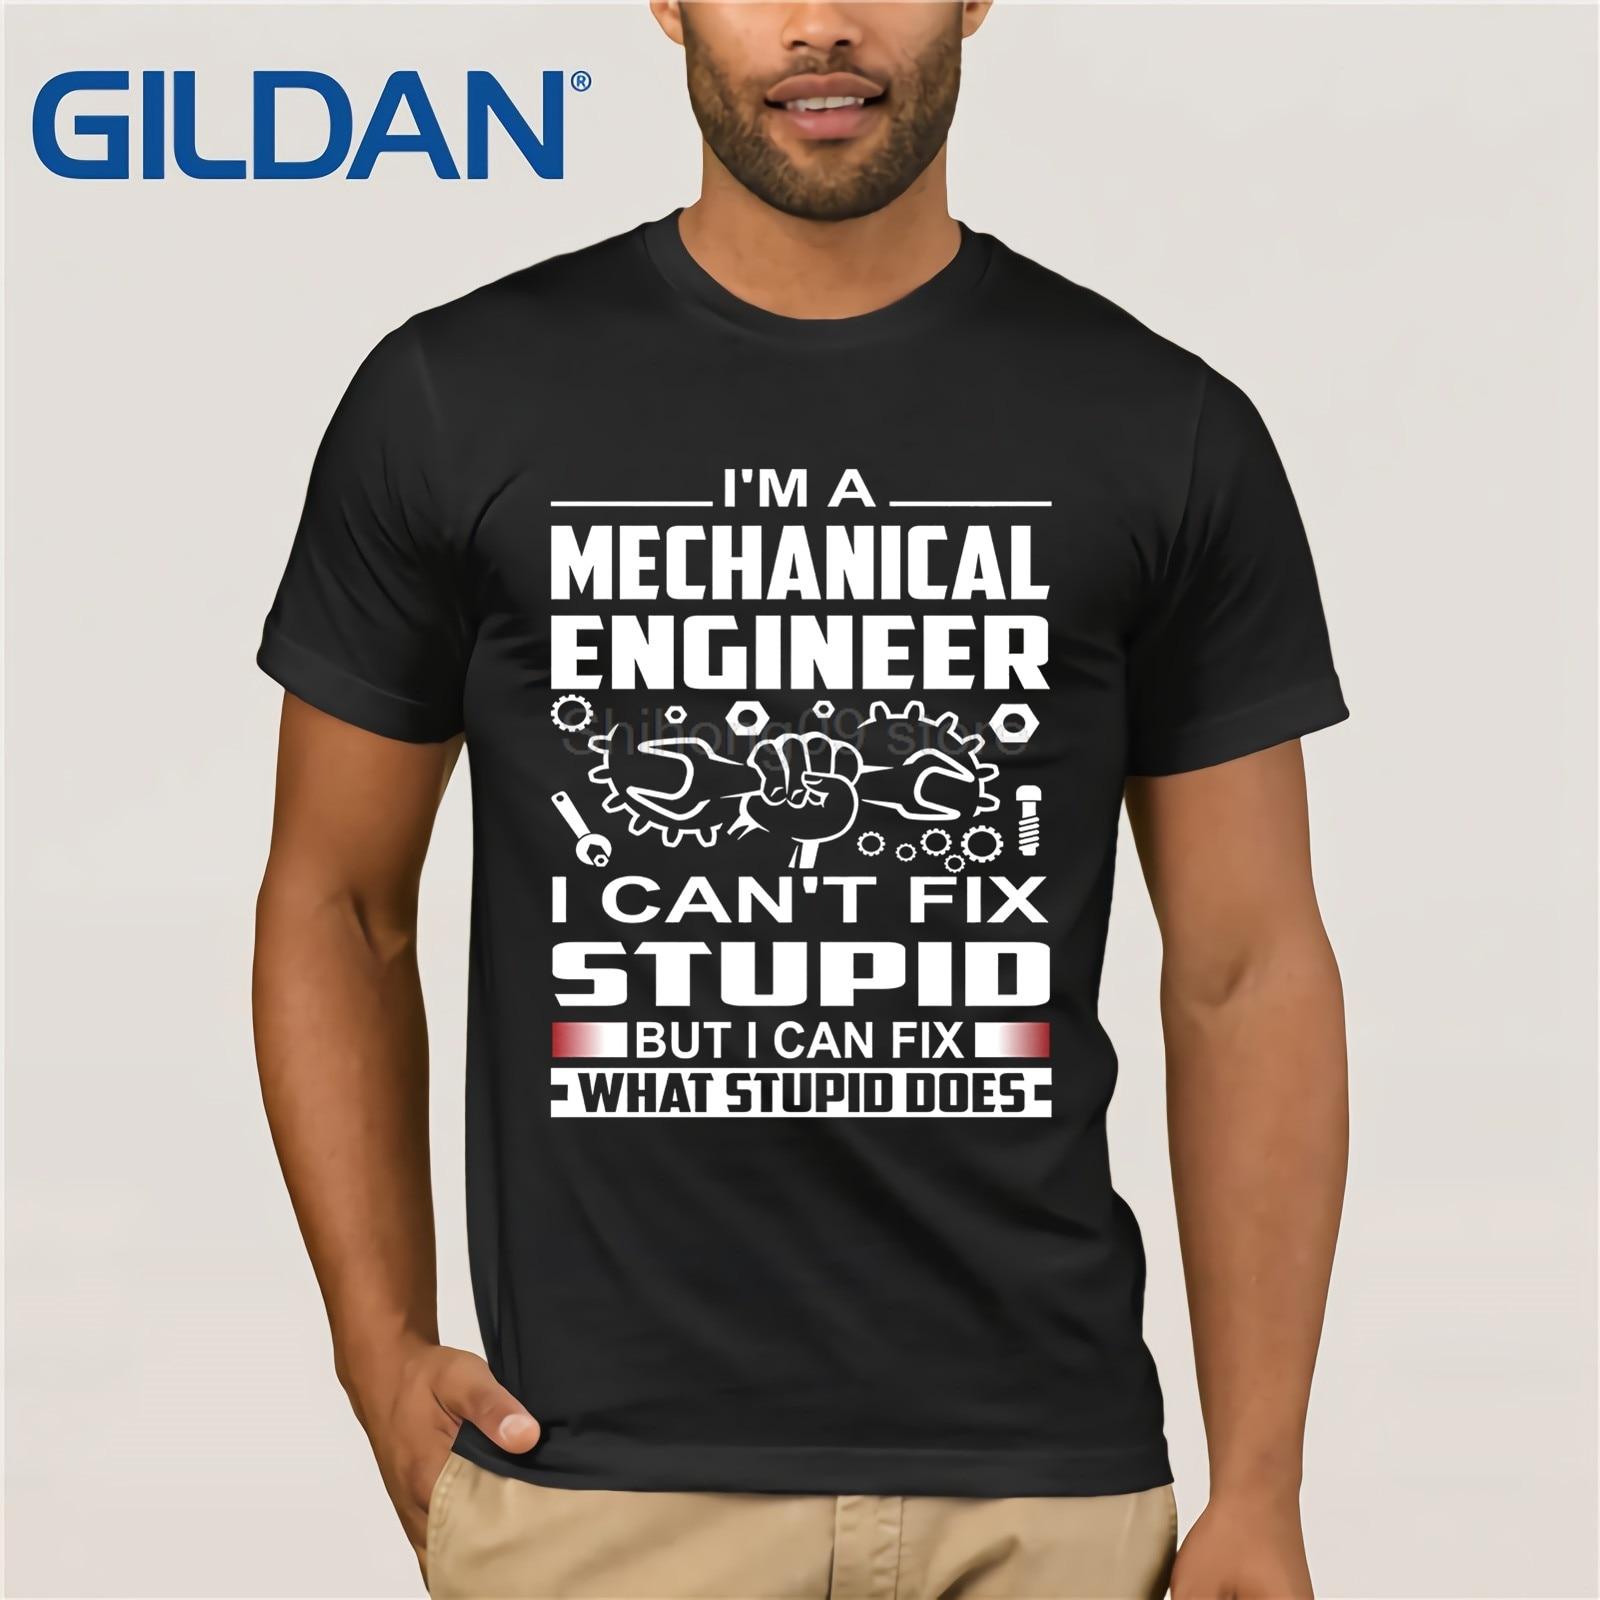 28ca4956c ... gildan mechanical engineer t shirt gifts mechanical engineering ...